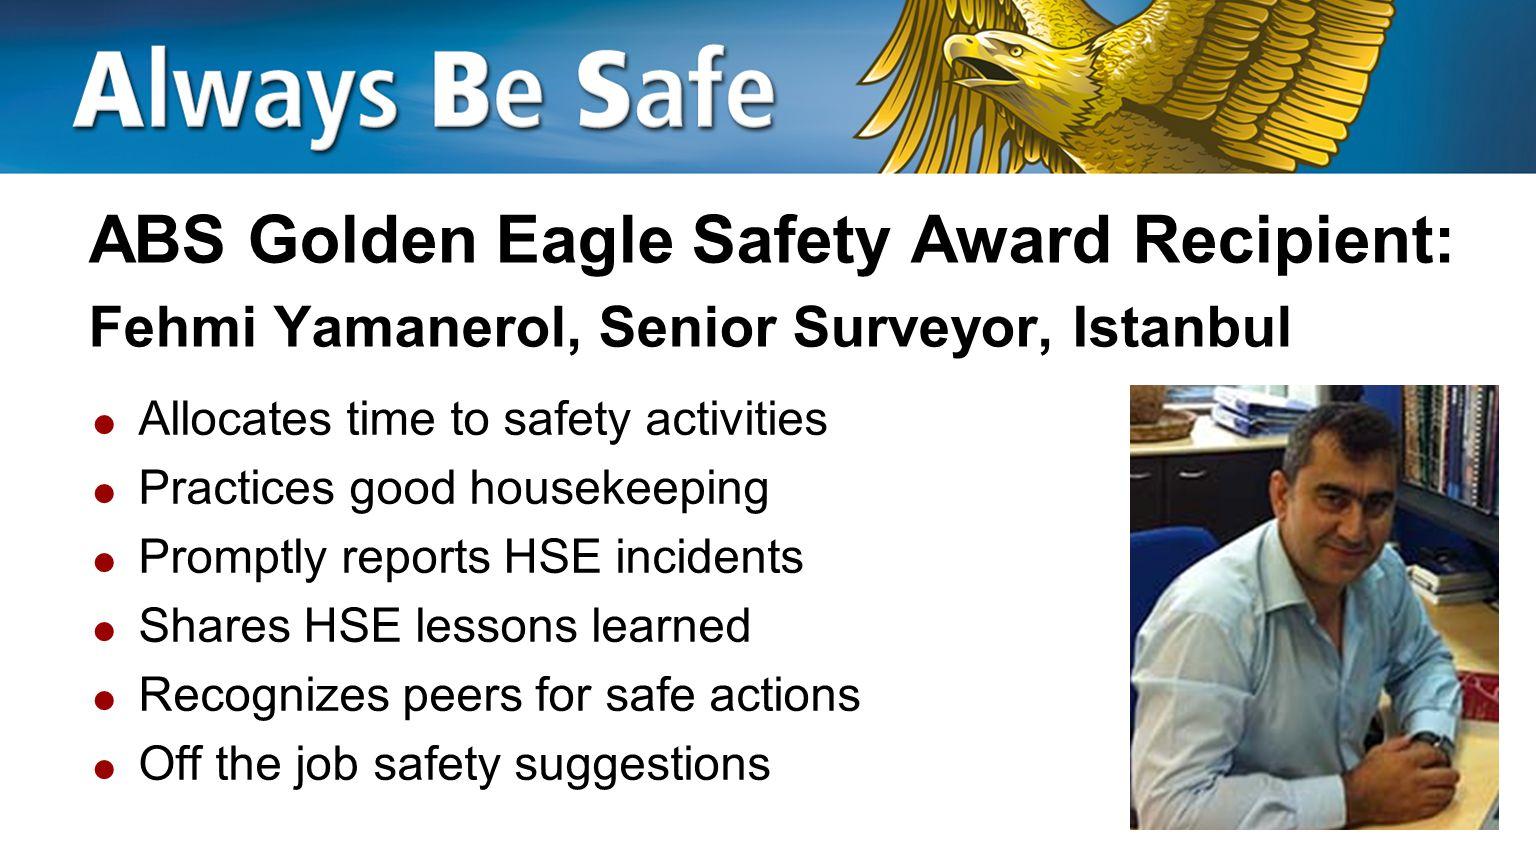 ABS Golden Eagle Safety Award Recipient: Fehmi Yamanerol, Senior Surveyor, Istanbul